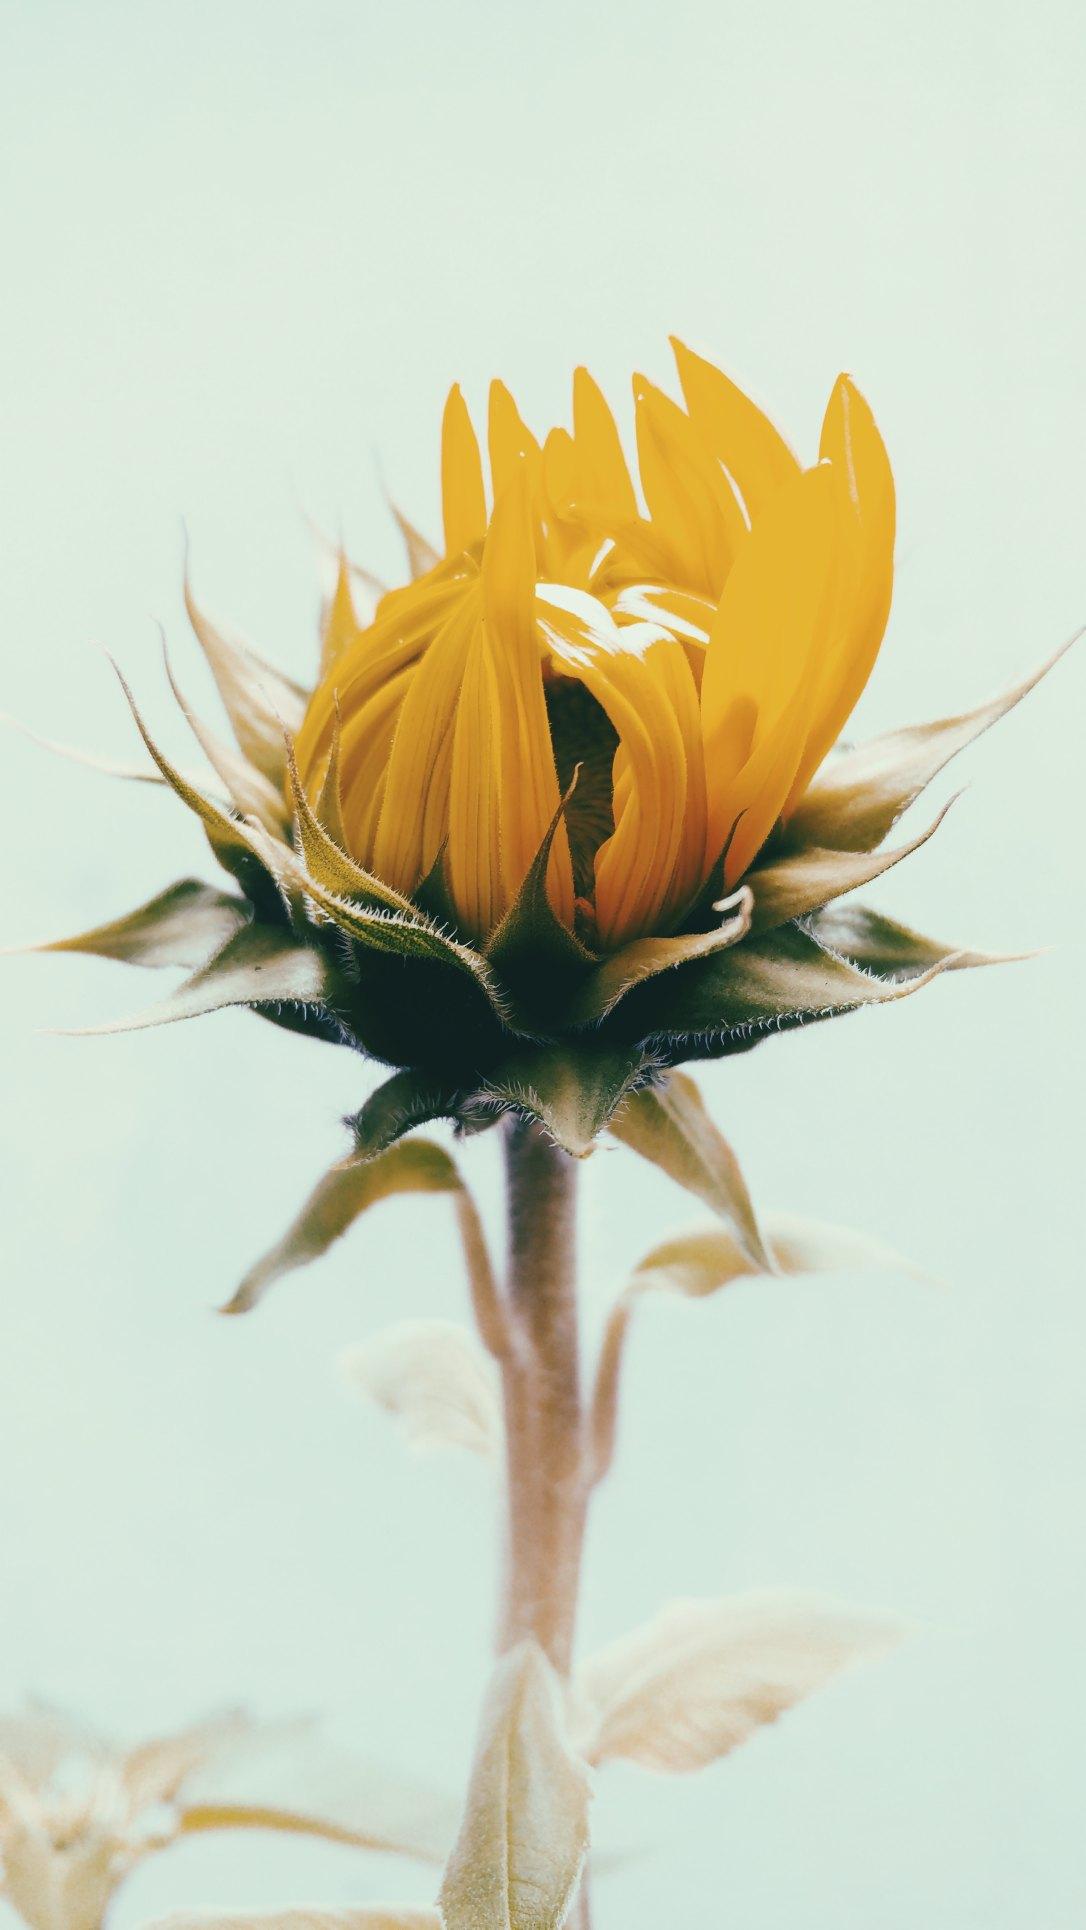 lucas-silva-pinheiro-santos-323448-unsplash